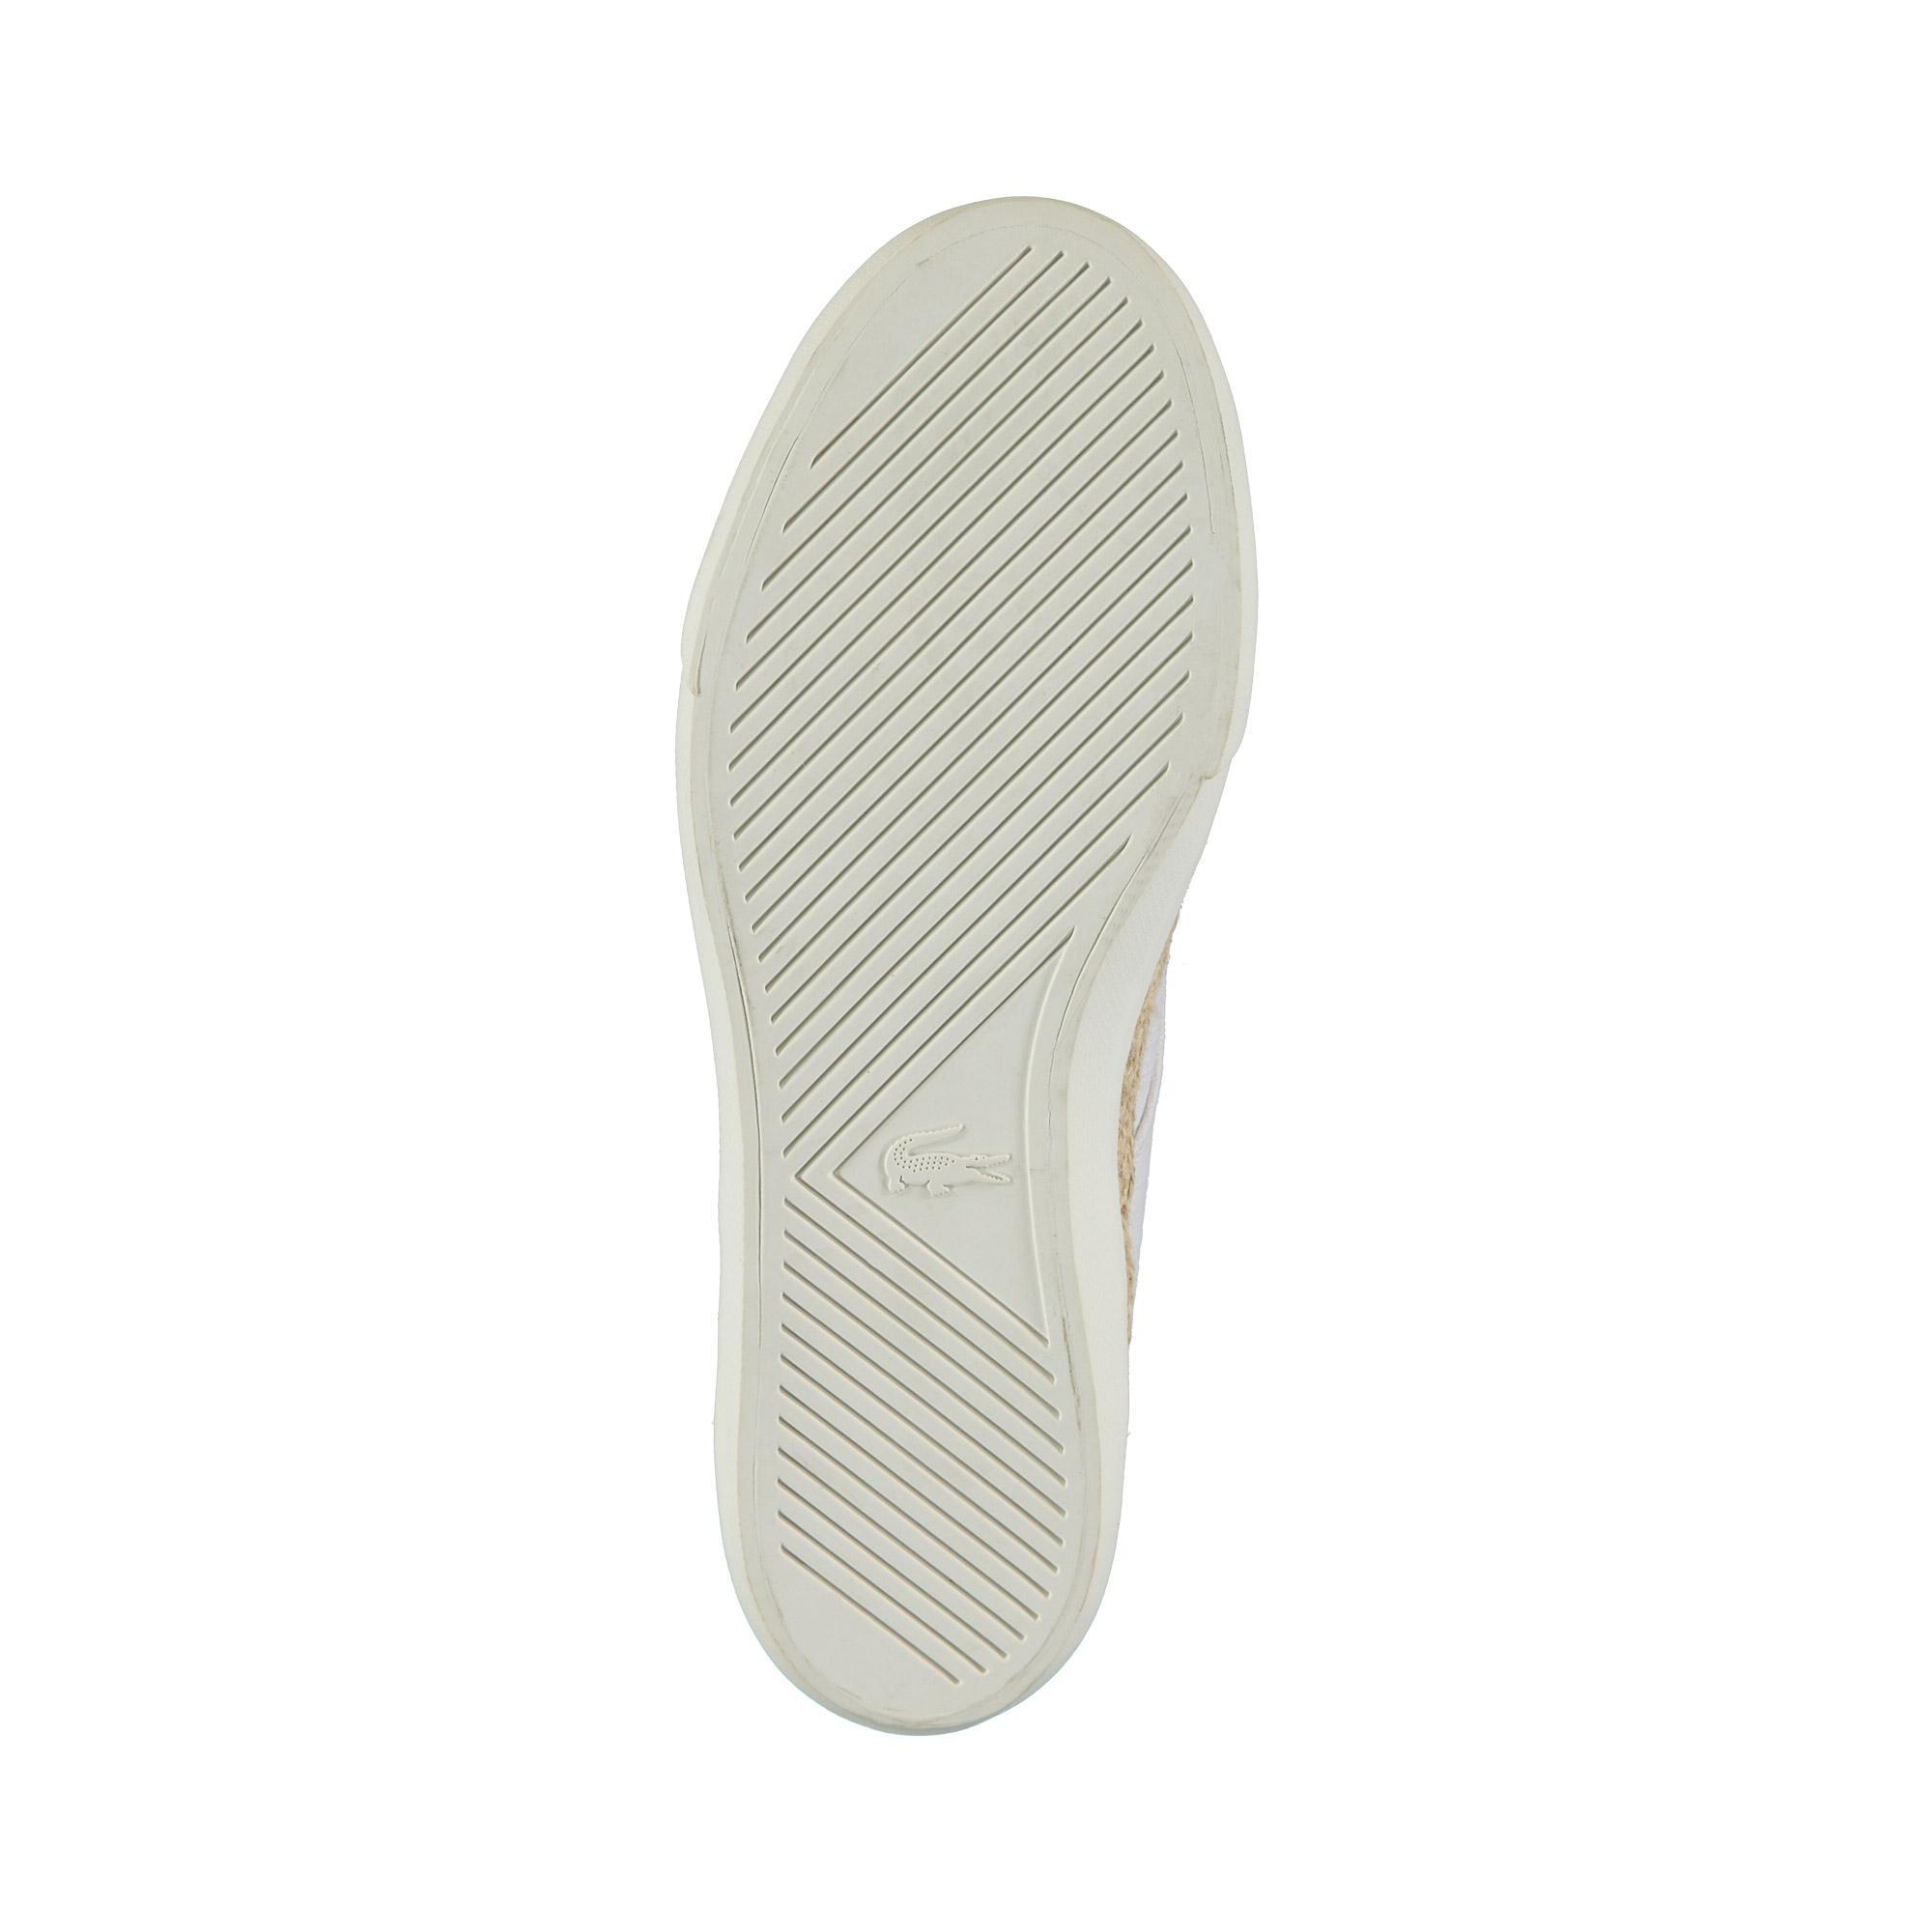 Lacoste Erkek Bej Esparre Jute 119 2 Casual Ayakkabı